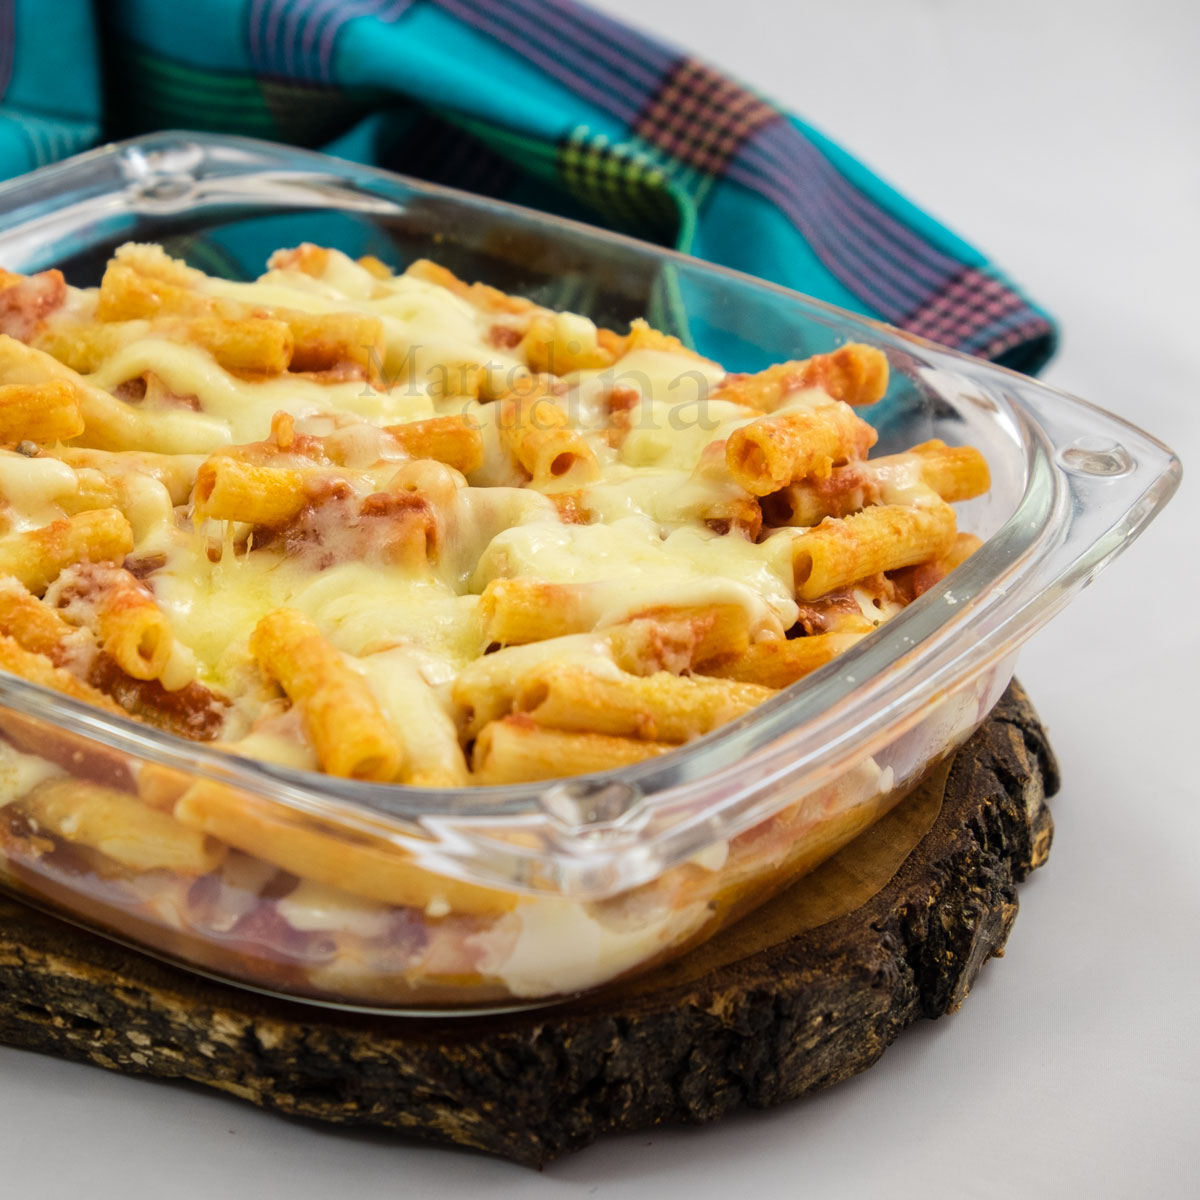 Pasta-forno-pizzaiola-B-1200x1200